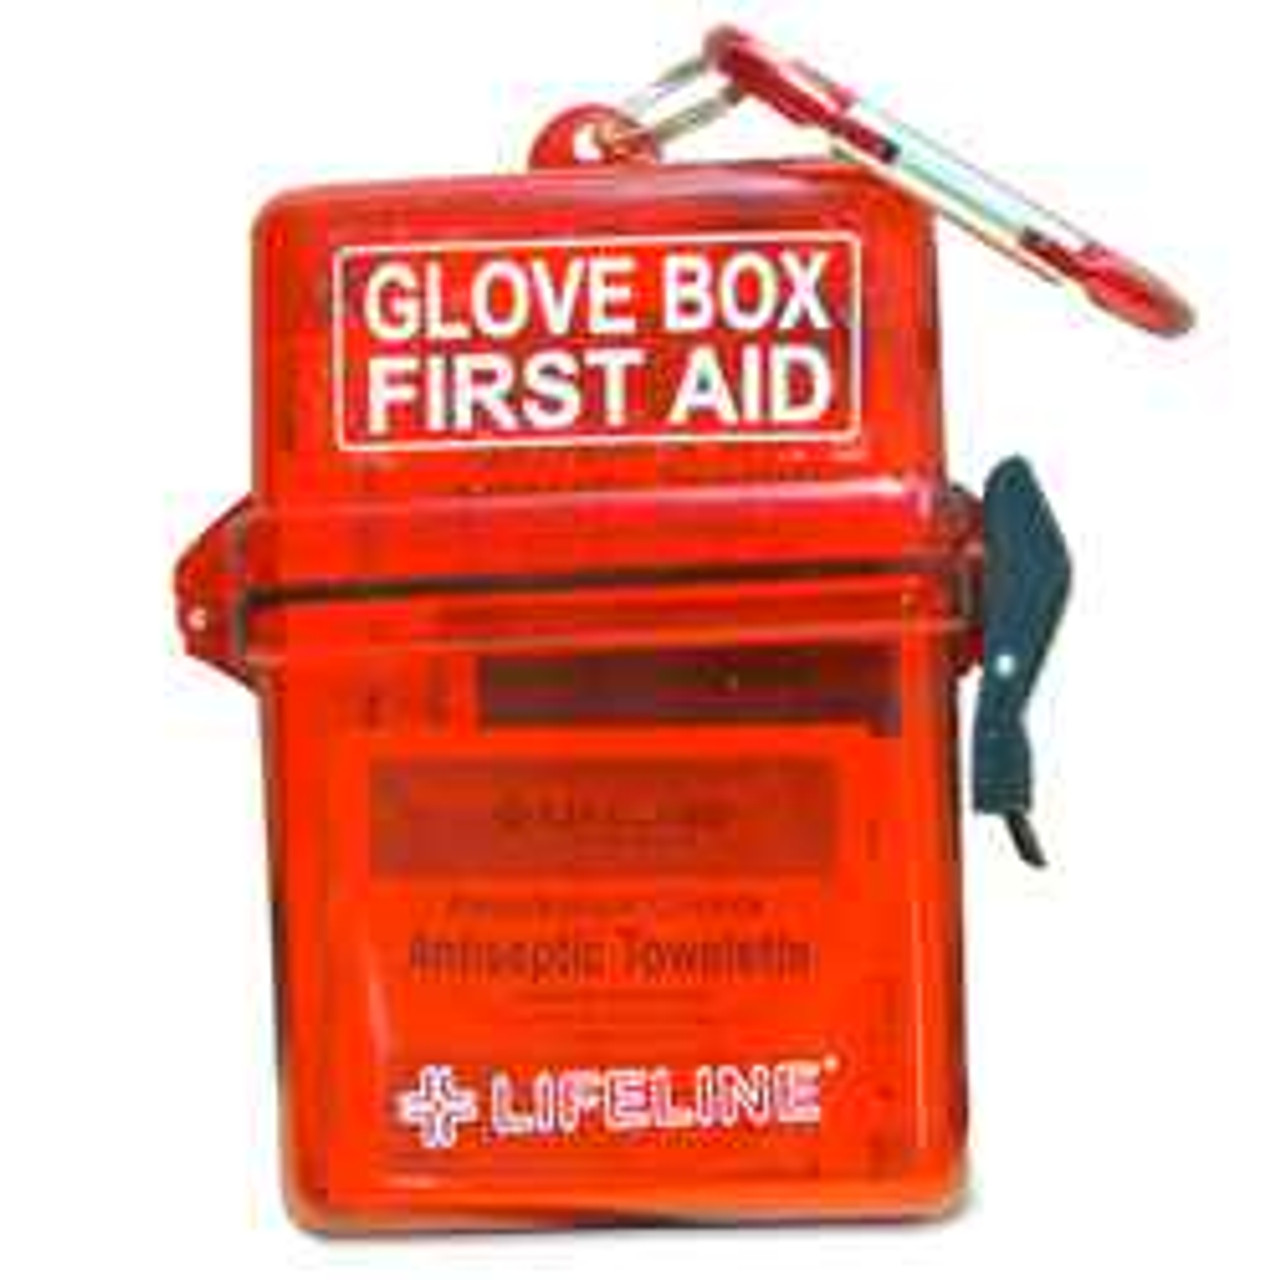 LifeLine Glove Box First Aid Kit